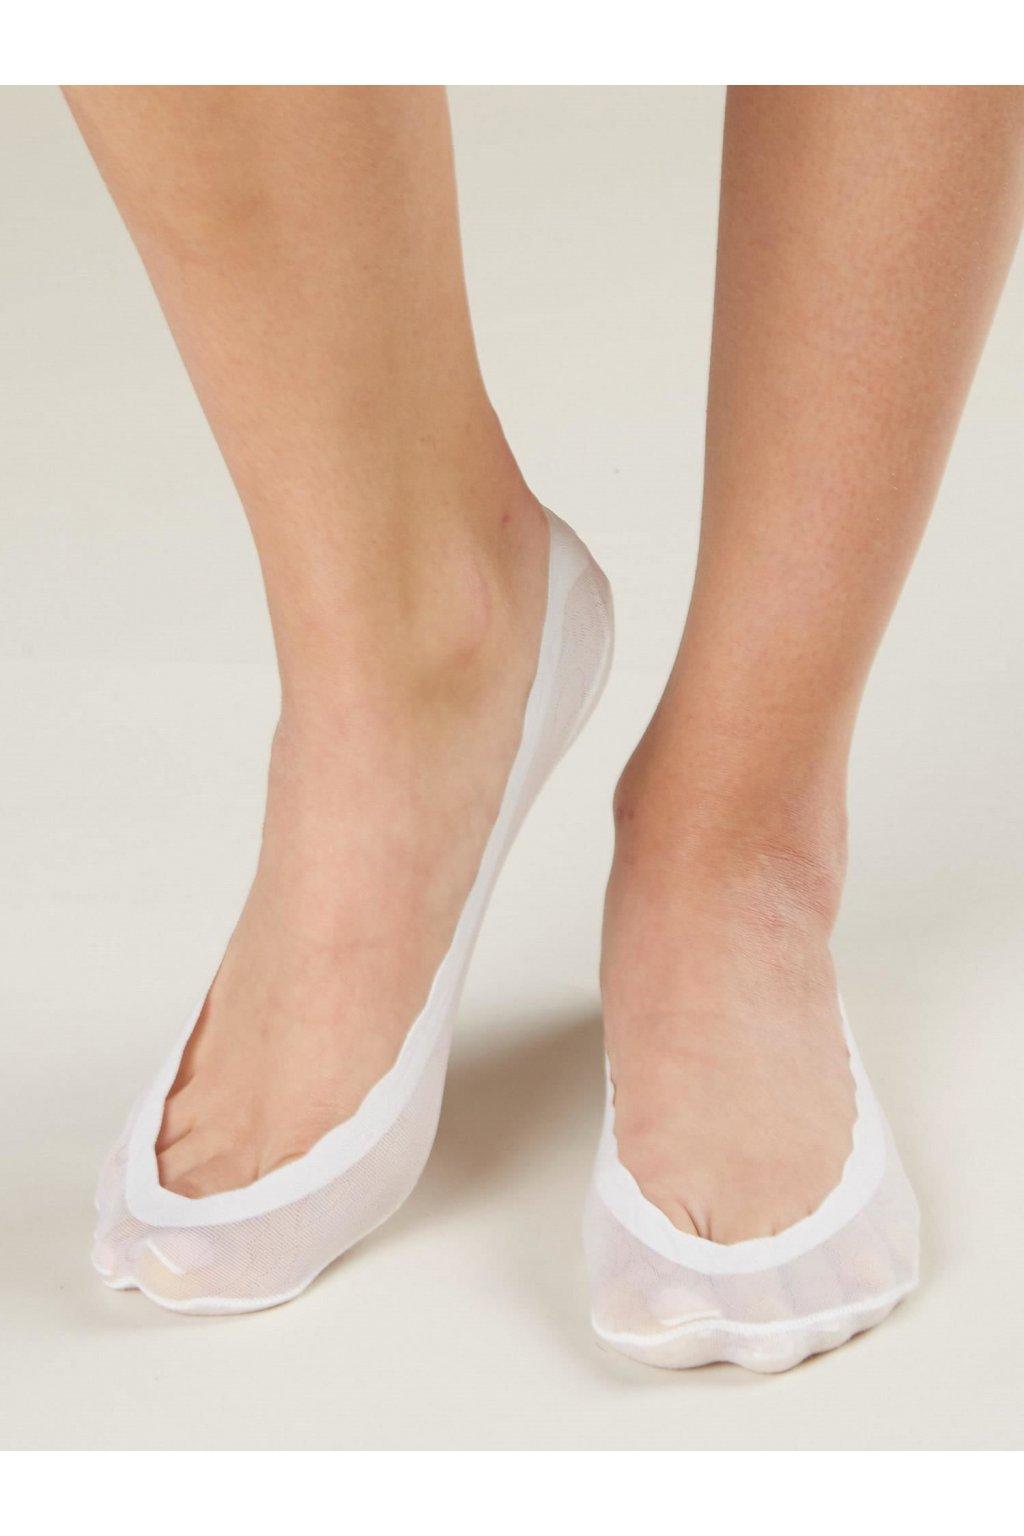 Dámske ponožky kód 7-SR-WSWC038(1)